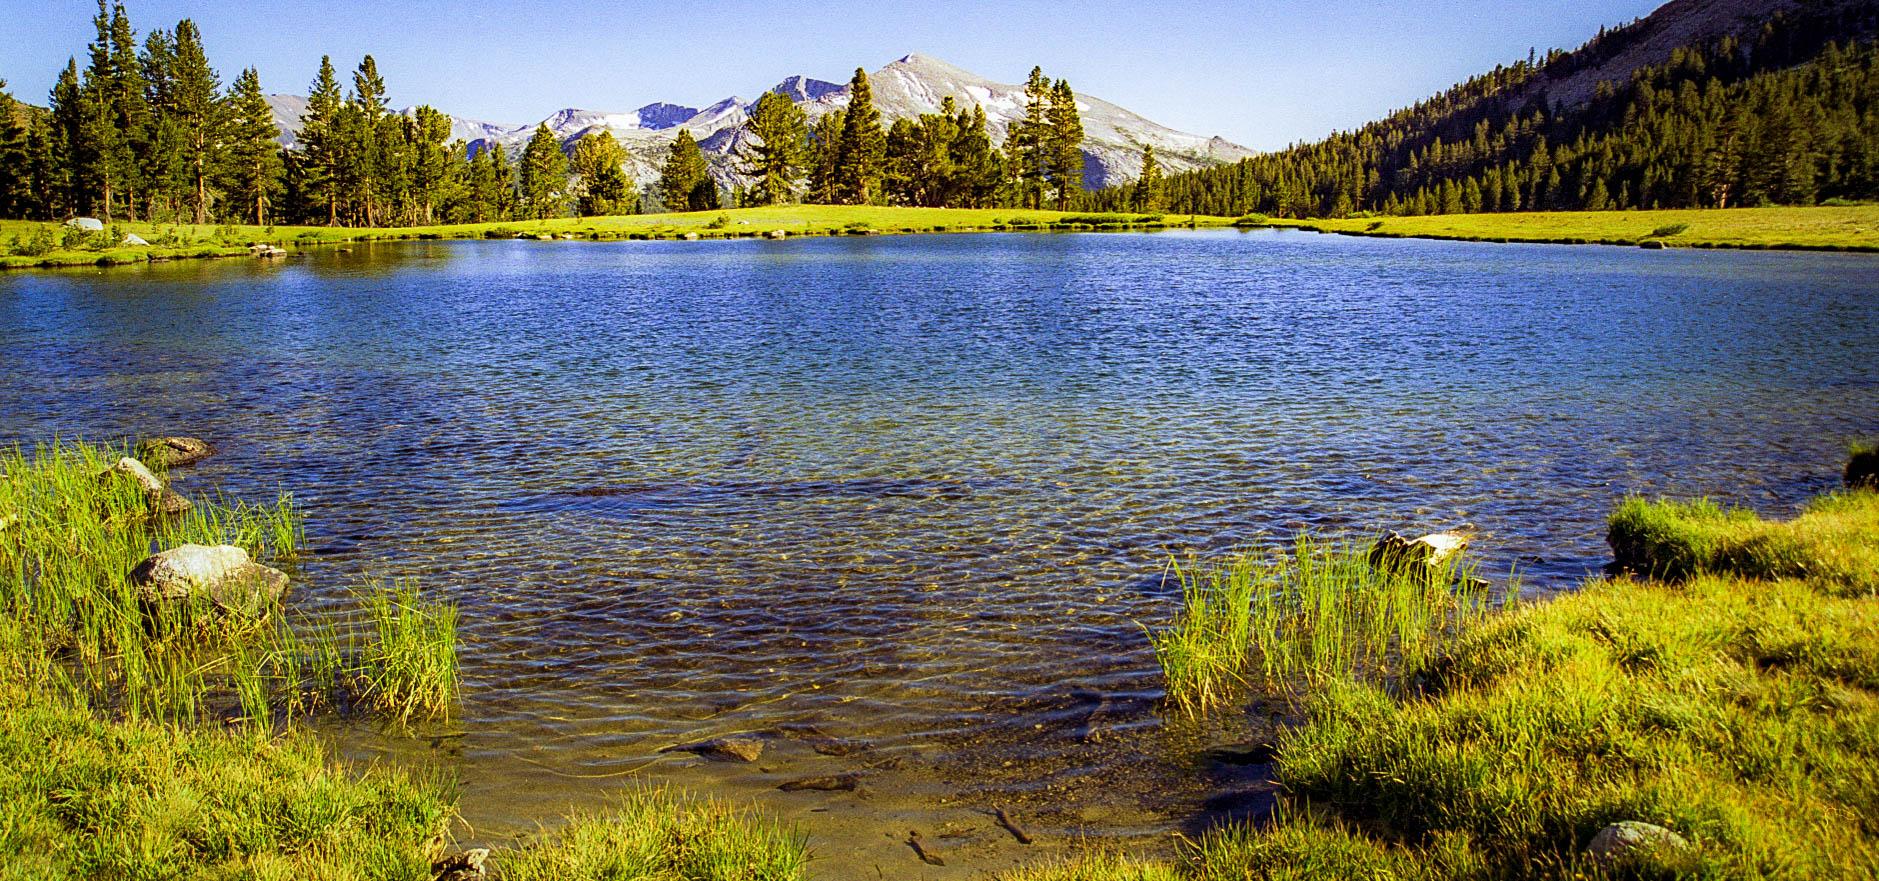 Yosemite : Tuolumne Meadows